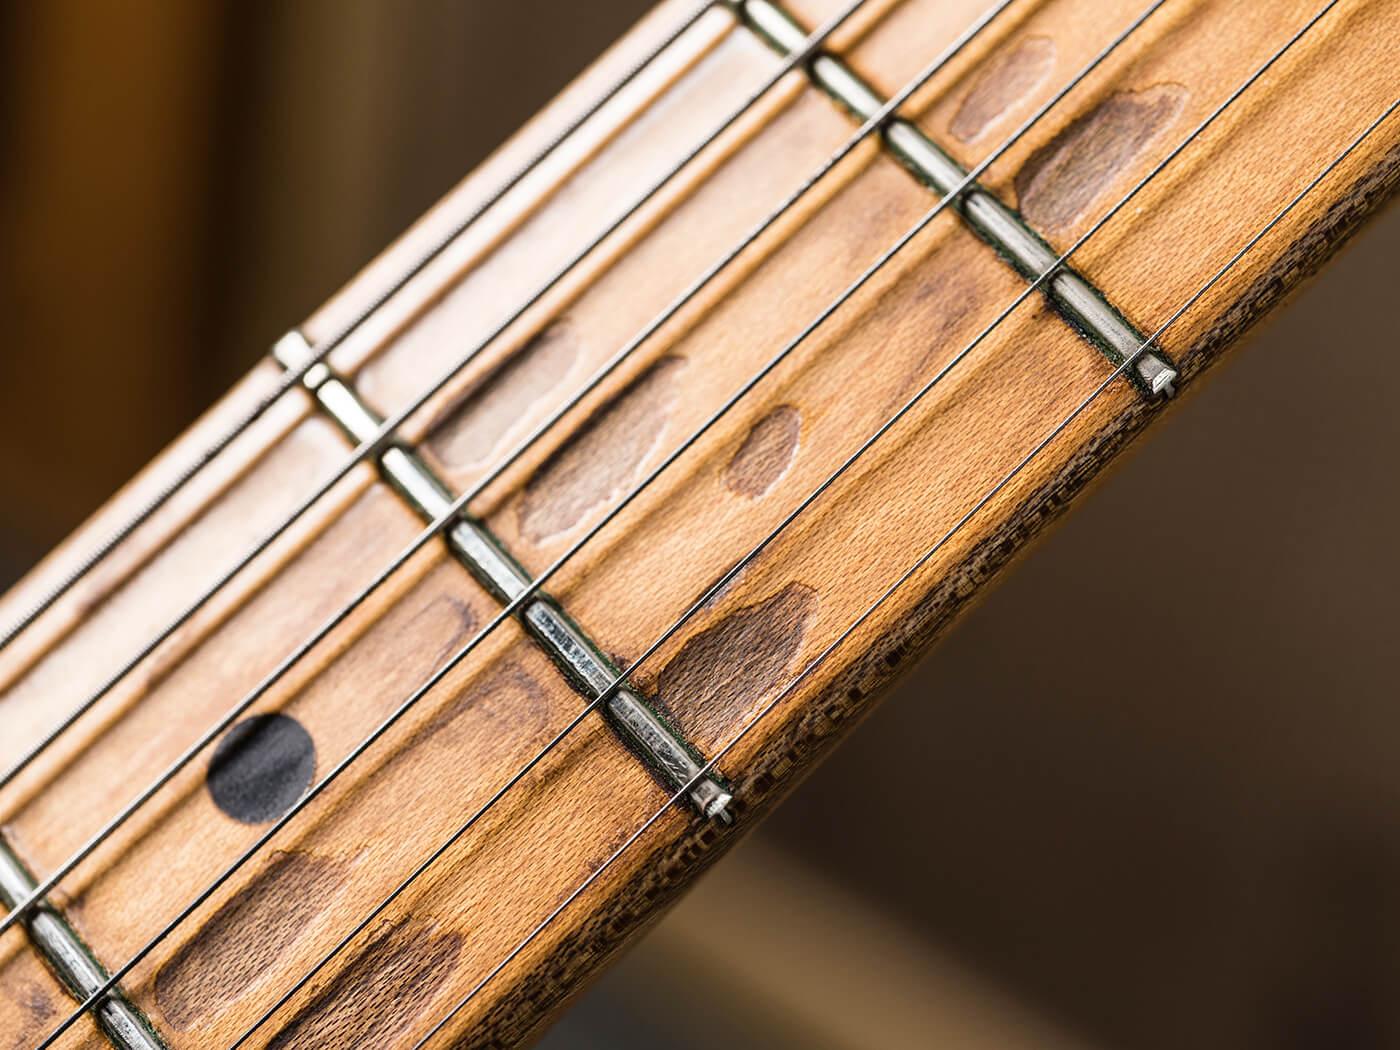 Gary Gand 1954 Fender Stratocaster (Fretboard)